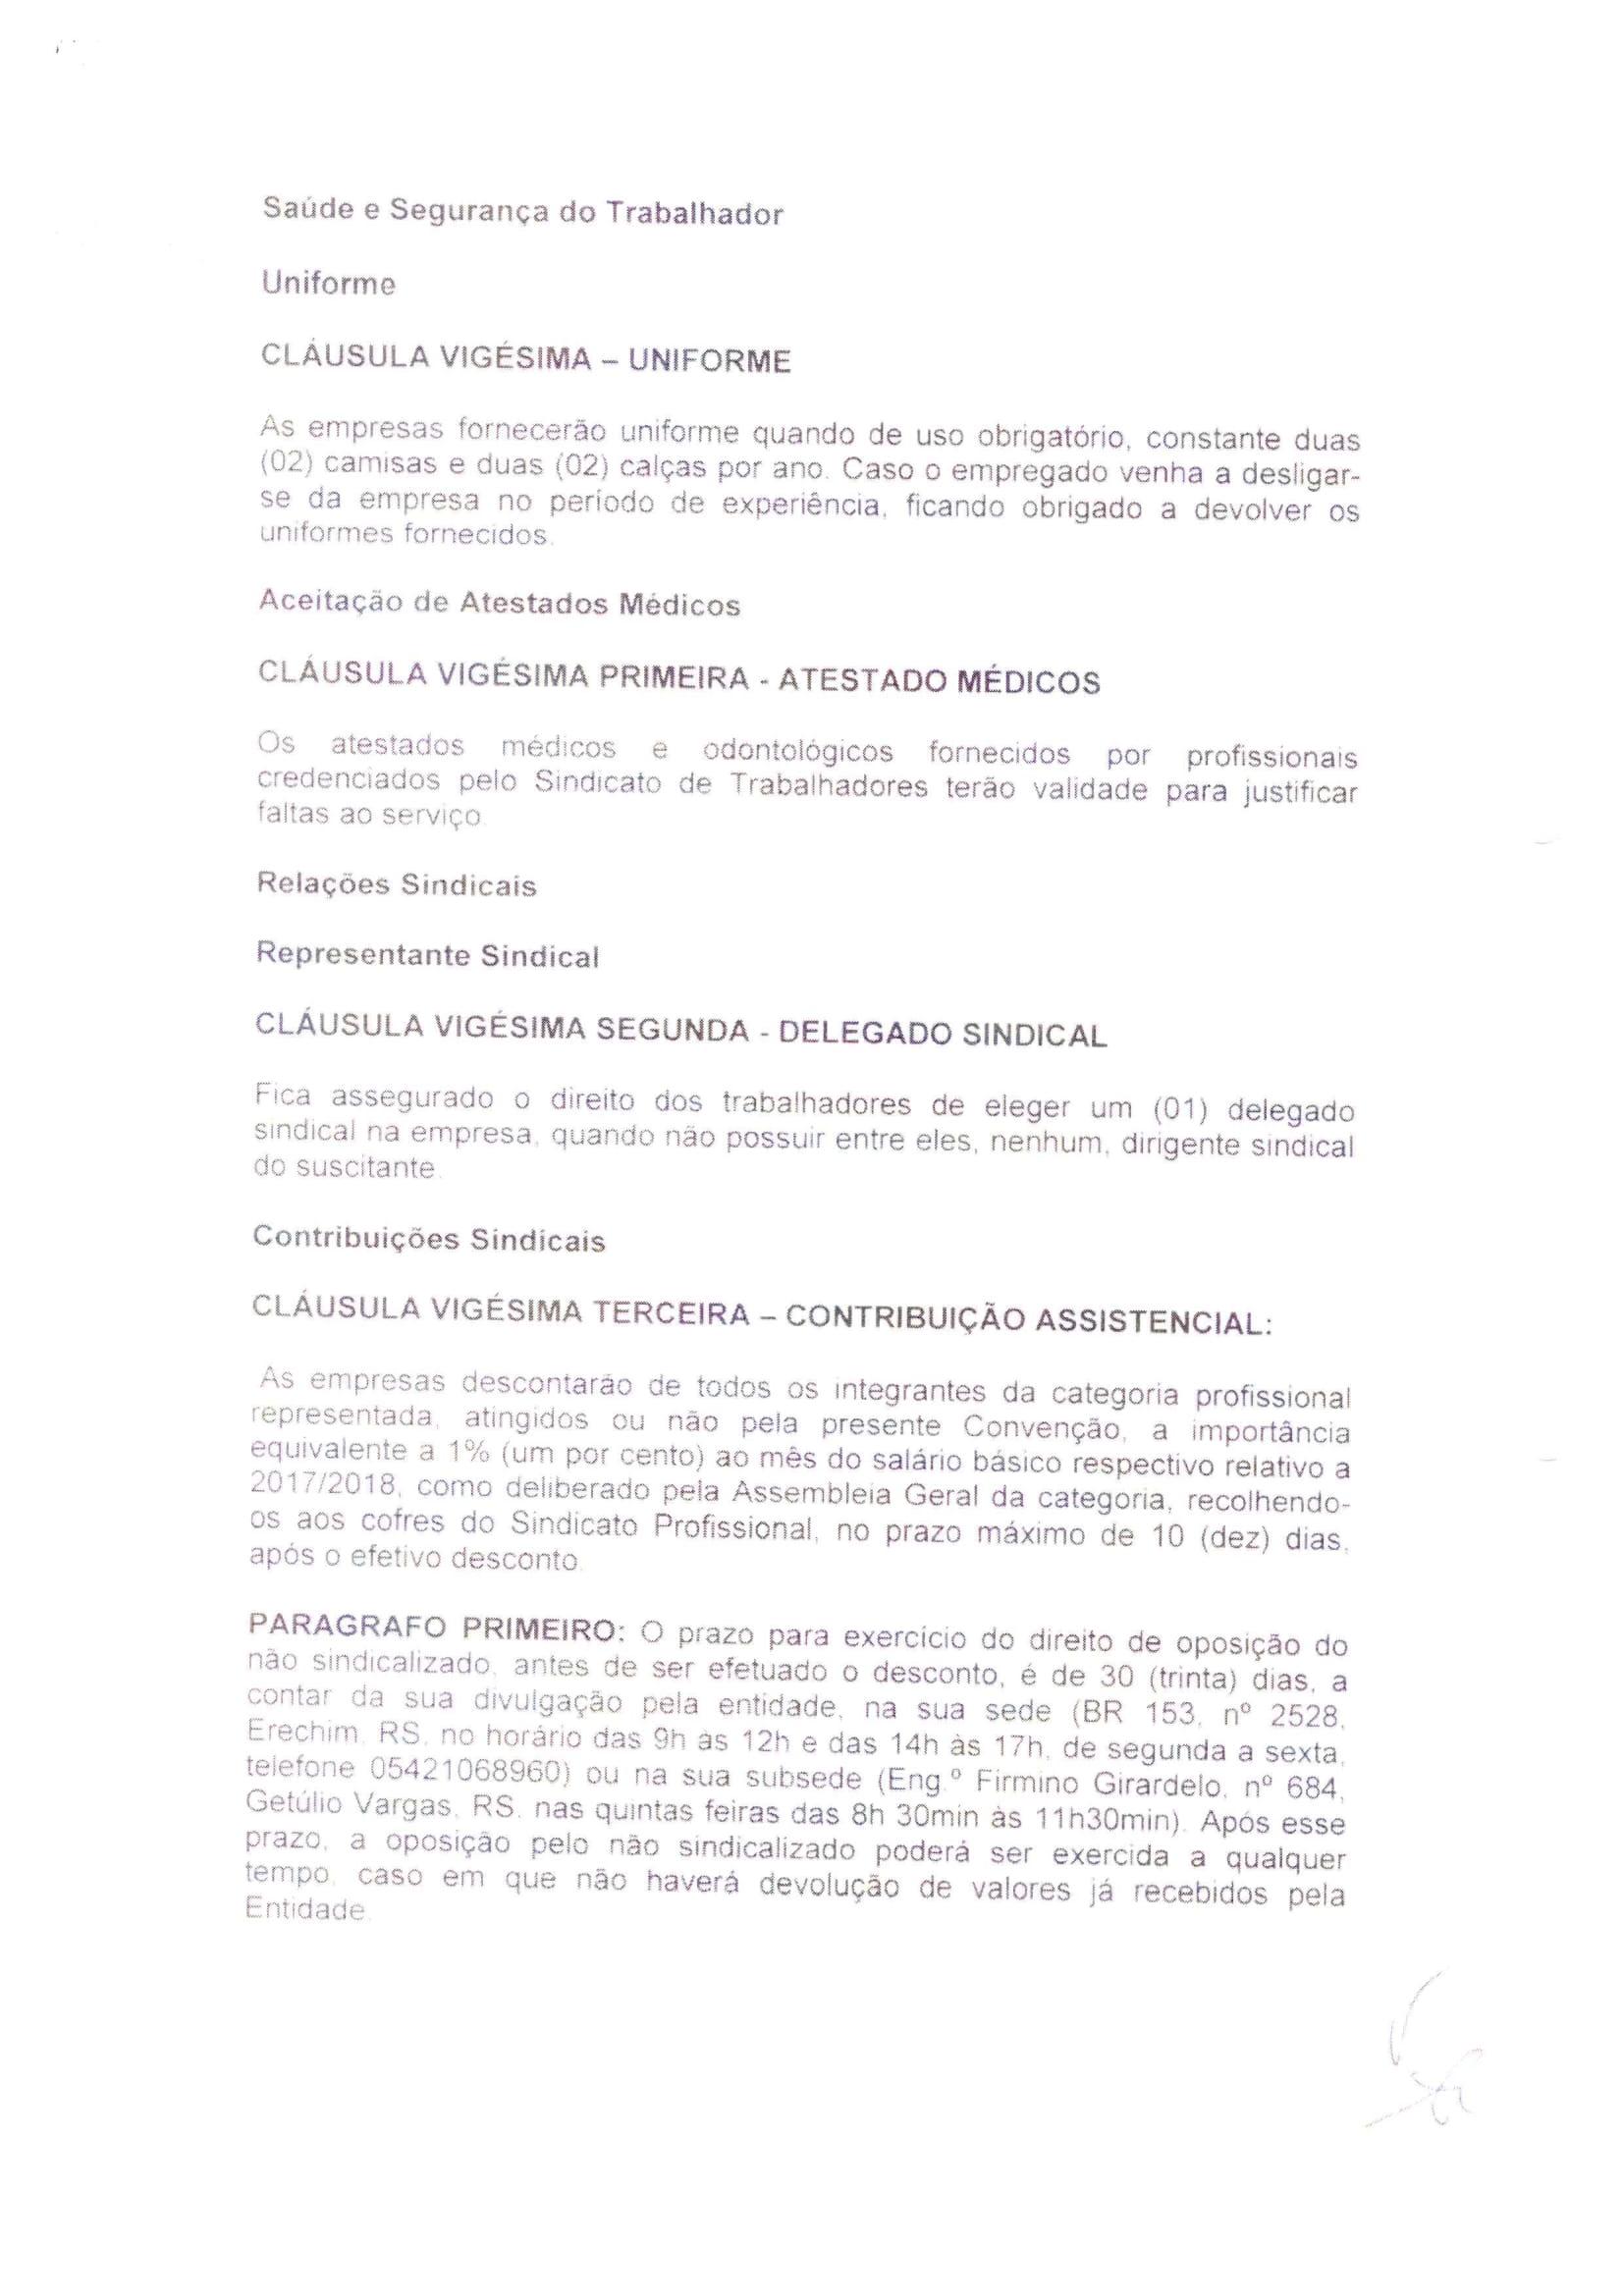 Tarifas - Atualizacao-10